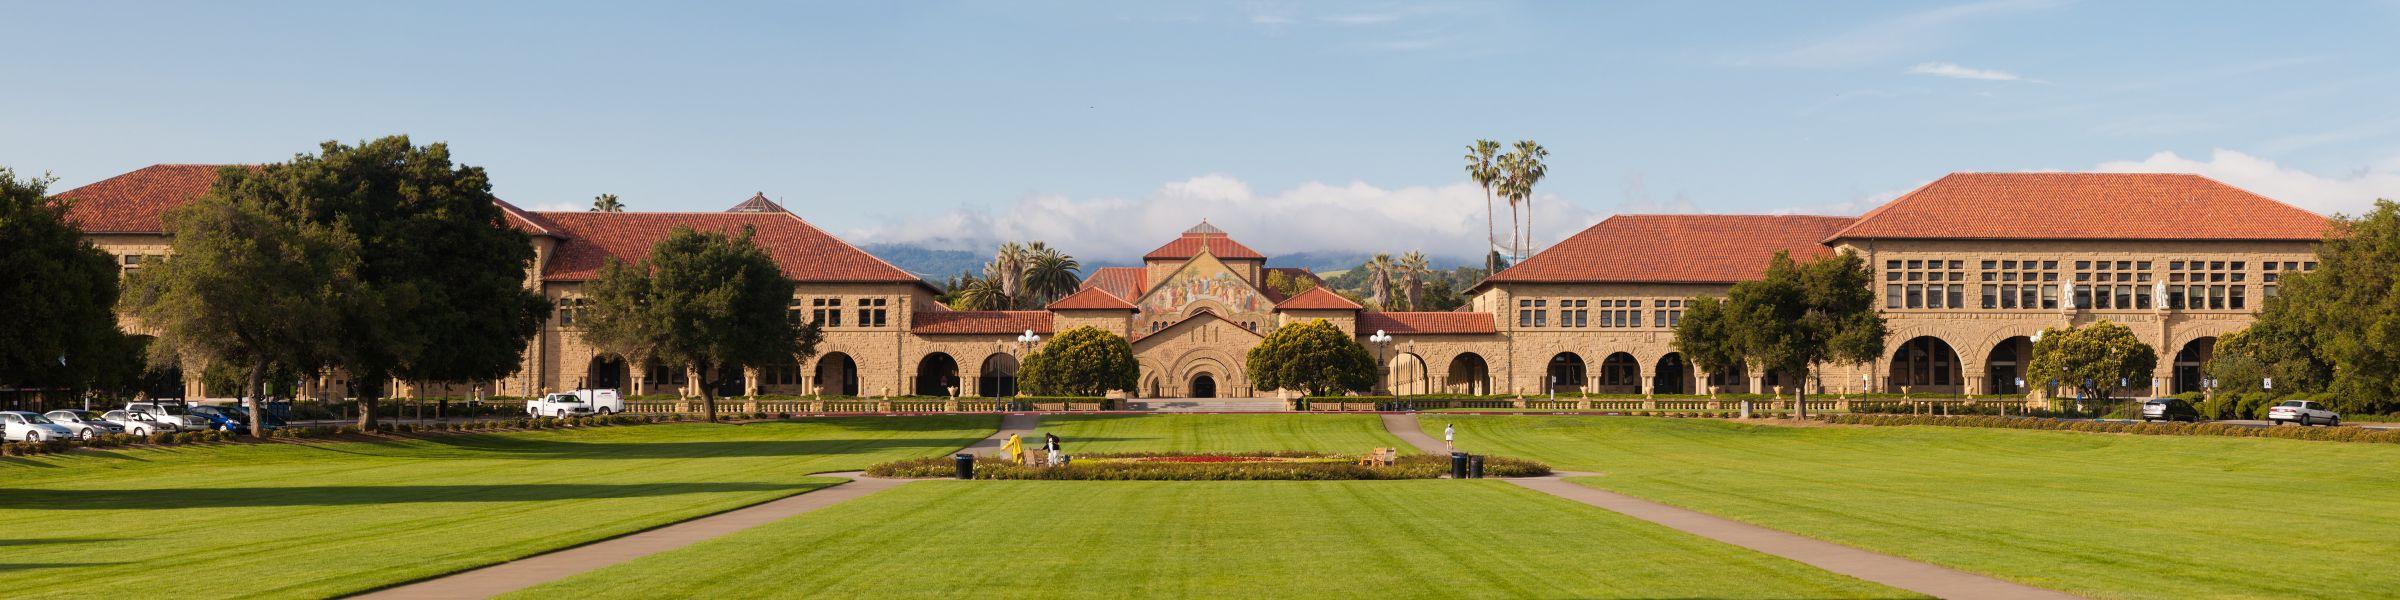 Stanford University Medical Center >> Stanford Sponsorship Stanford O Connor Family Medicine